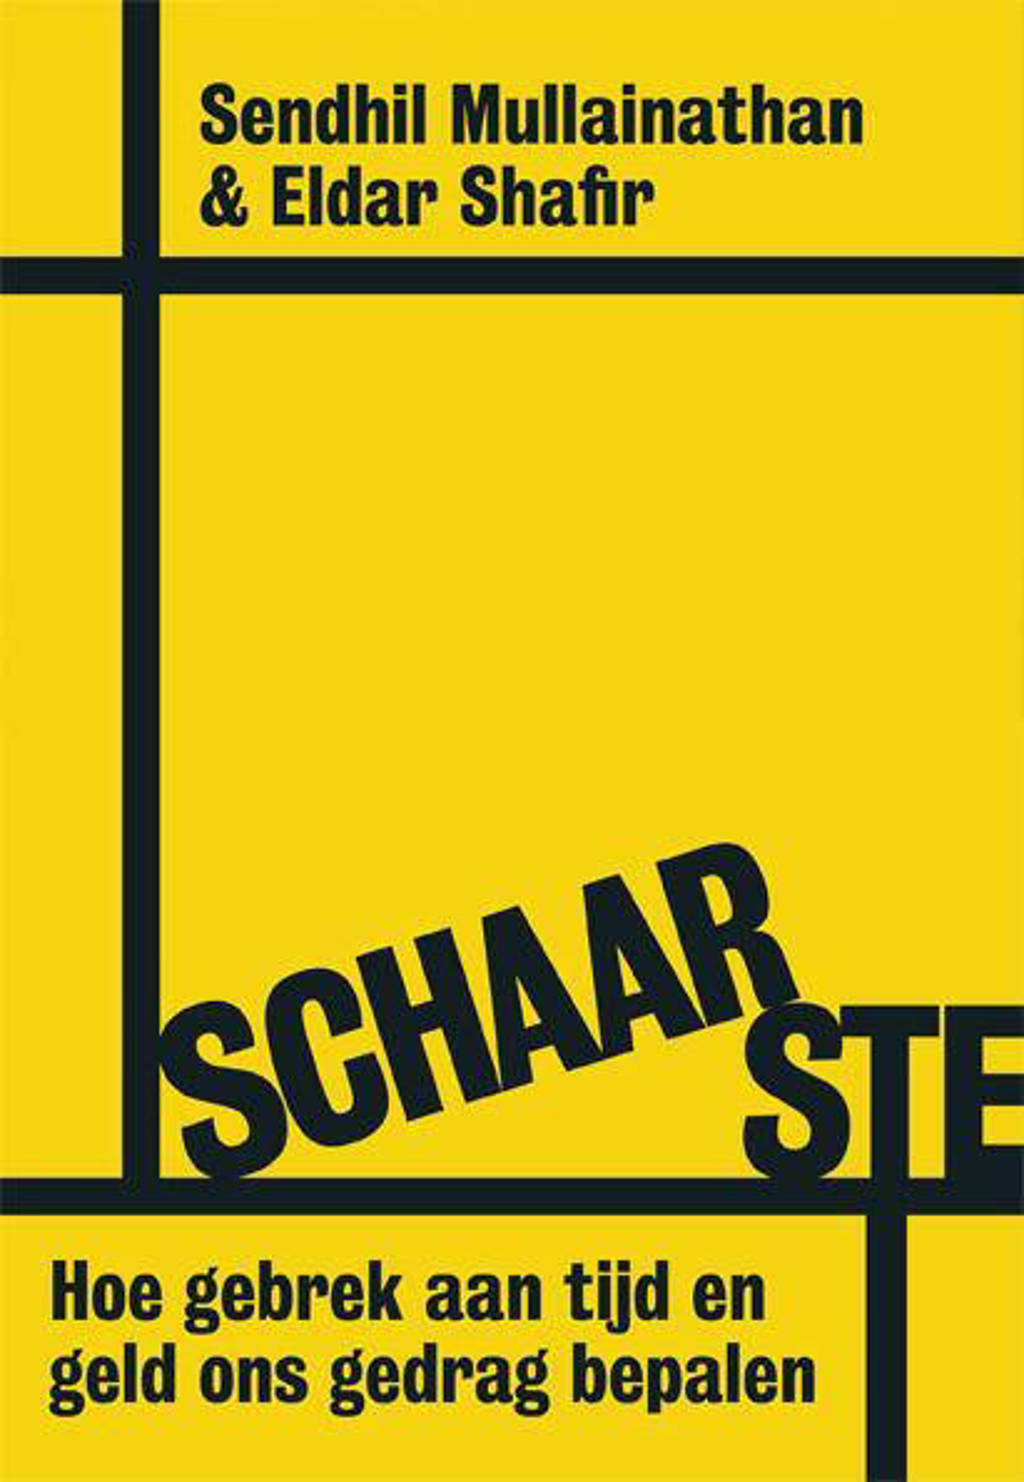 Schaarste - Sendhil Mullainathan en Eldar Shafir